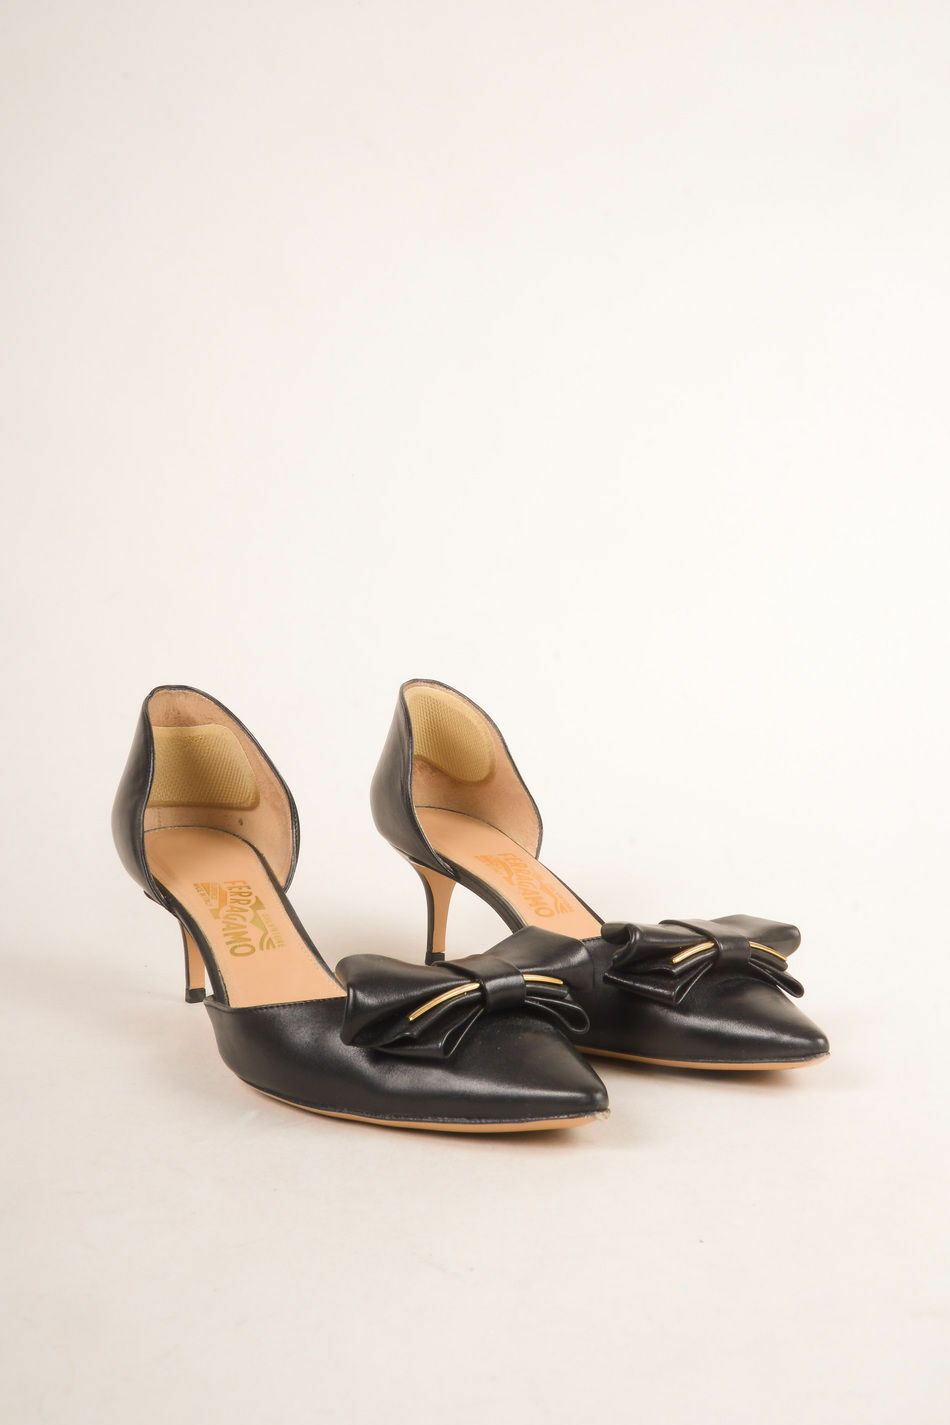 RARESalvatore Ferragamo Black Leather Pointed Toe Kitten Heel Bow Pumps